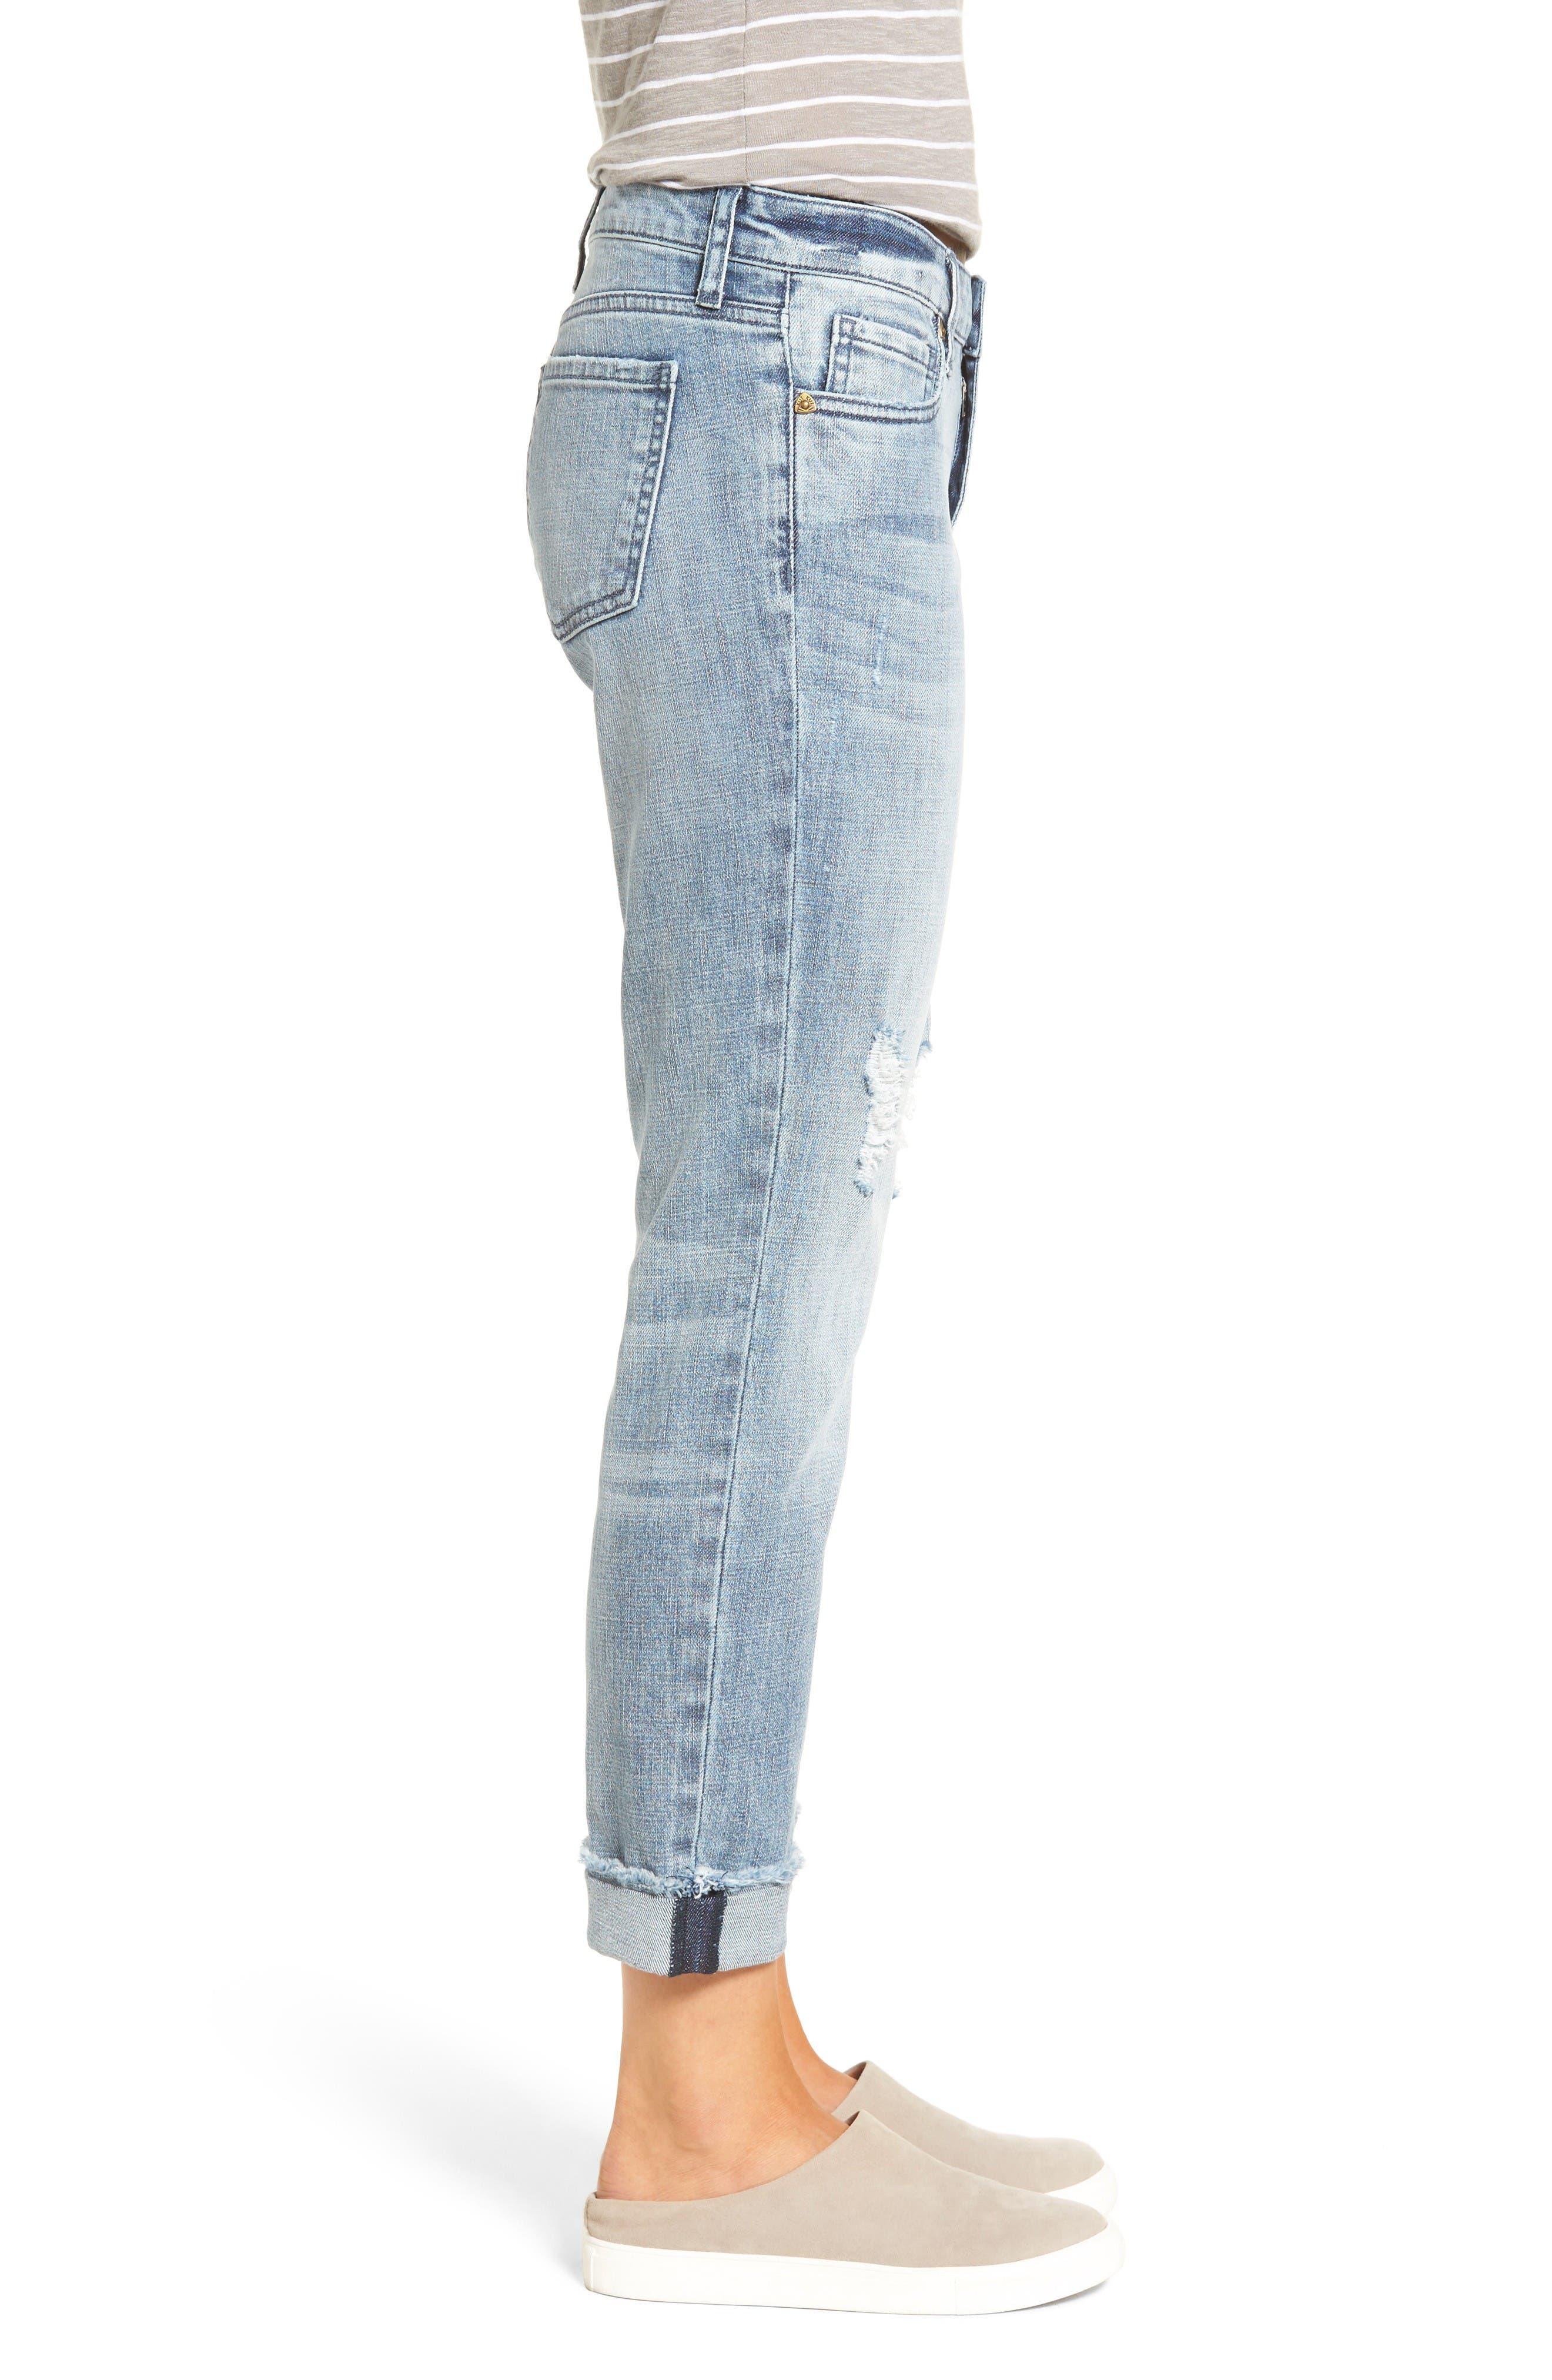 Alternate Image 3  - KUT from the Kloth Catherine Distressed Frayed Hem Boyfriend Jeans (Heartiness)